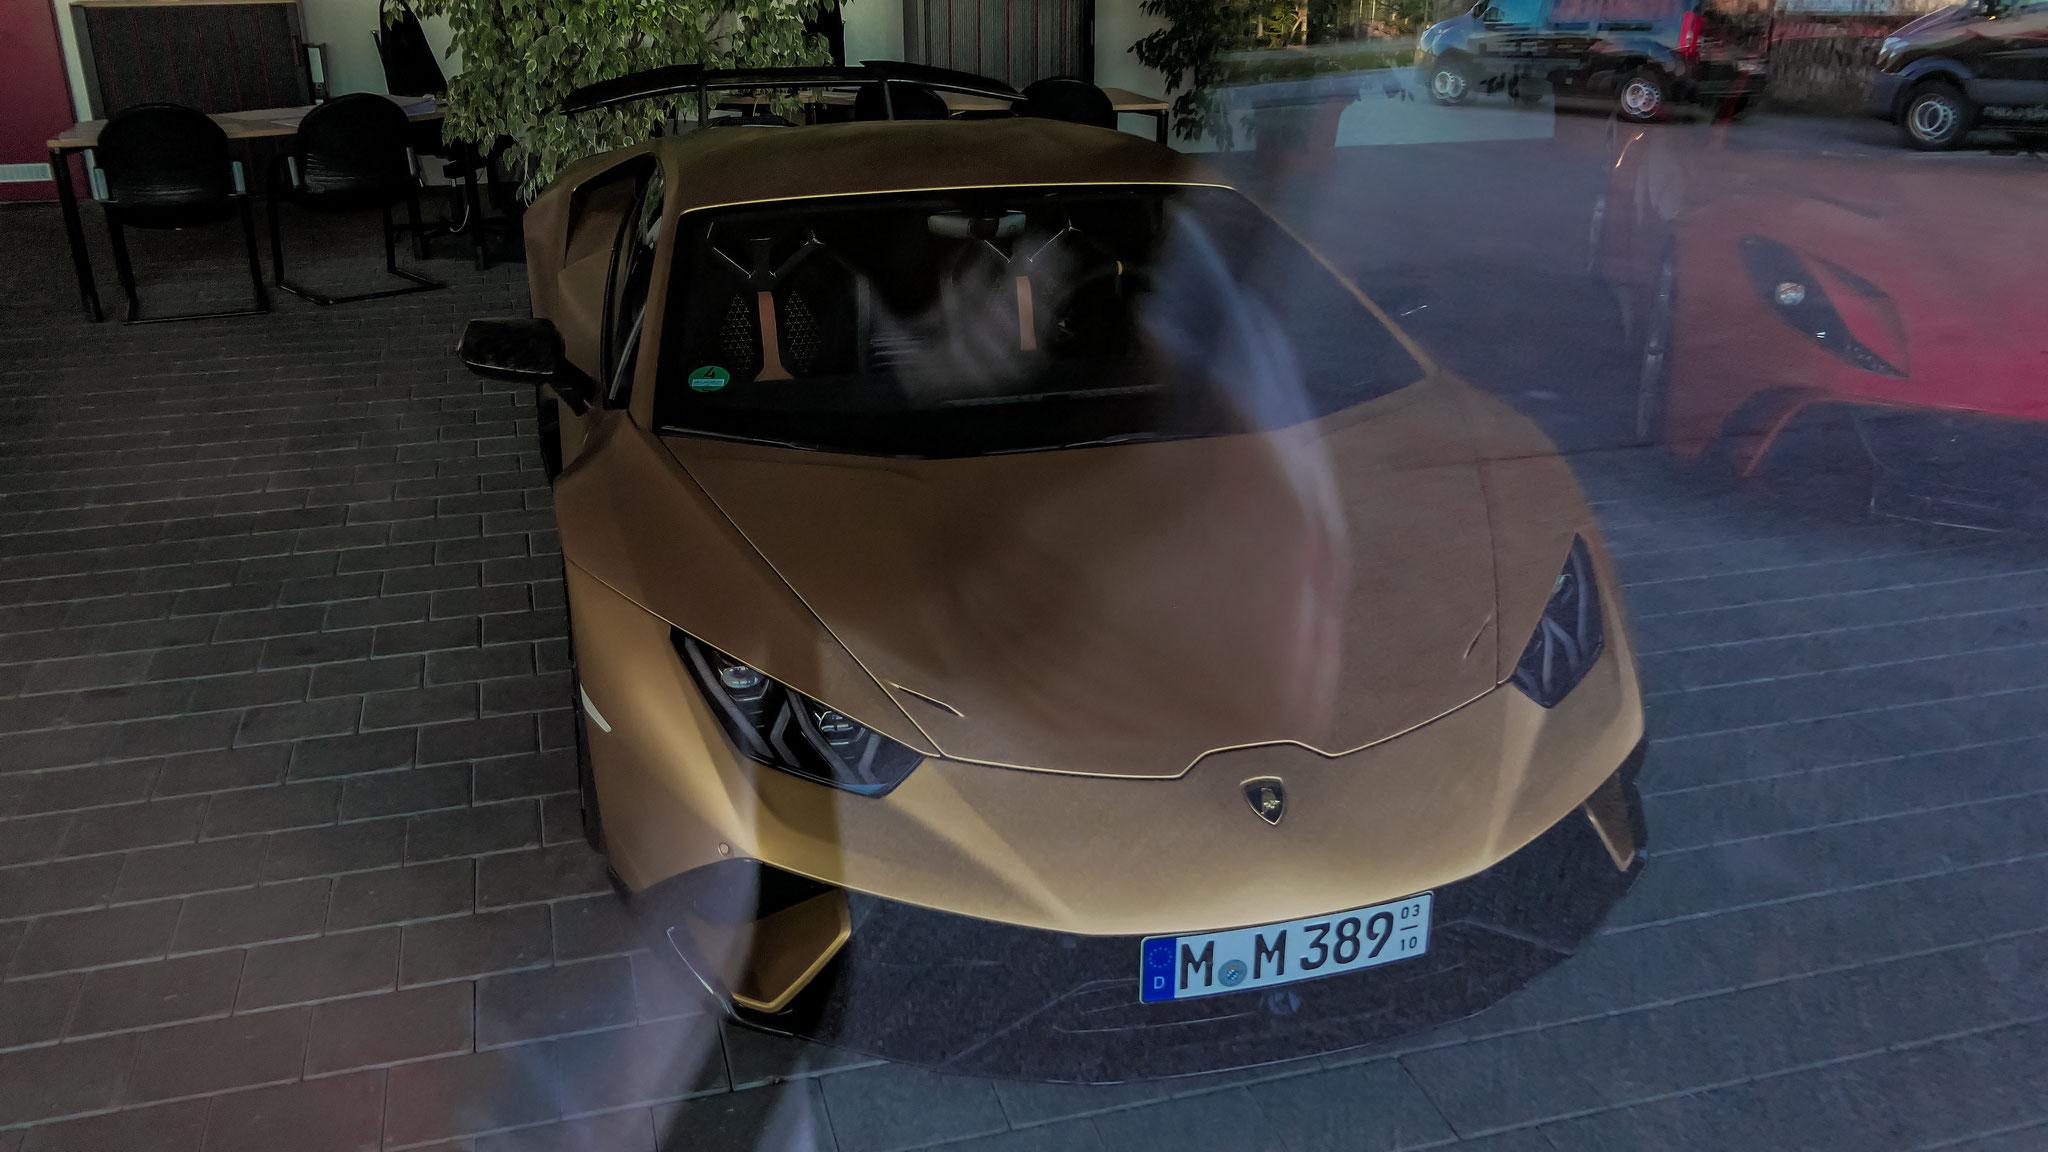 Lamborghini Huracan Performante - M-M-389